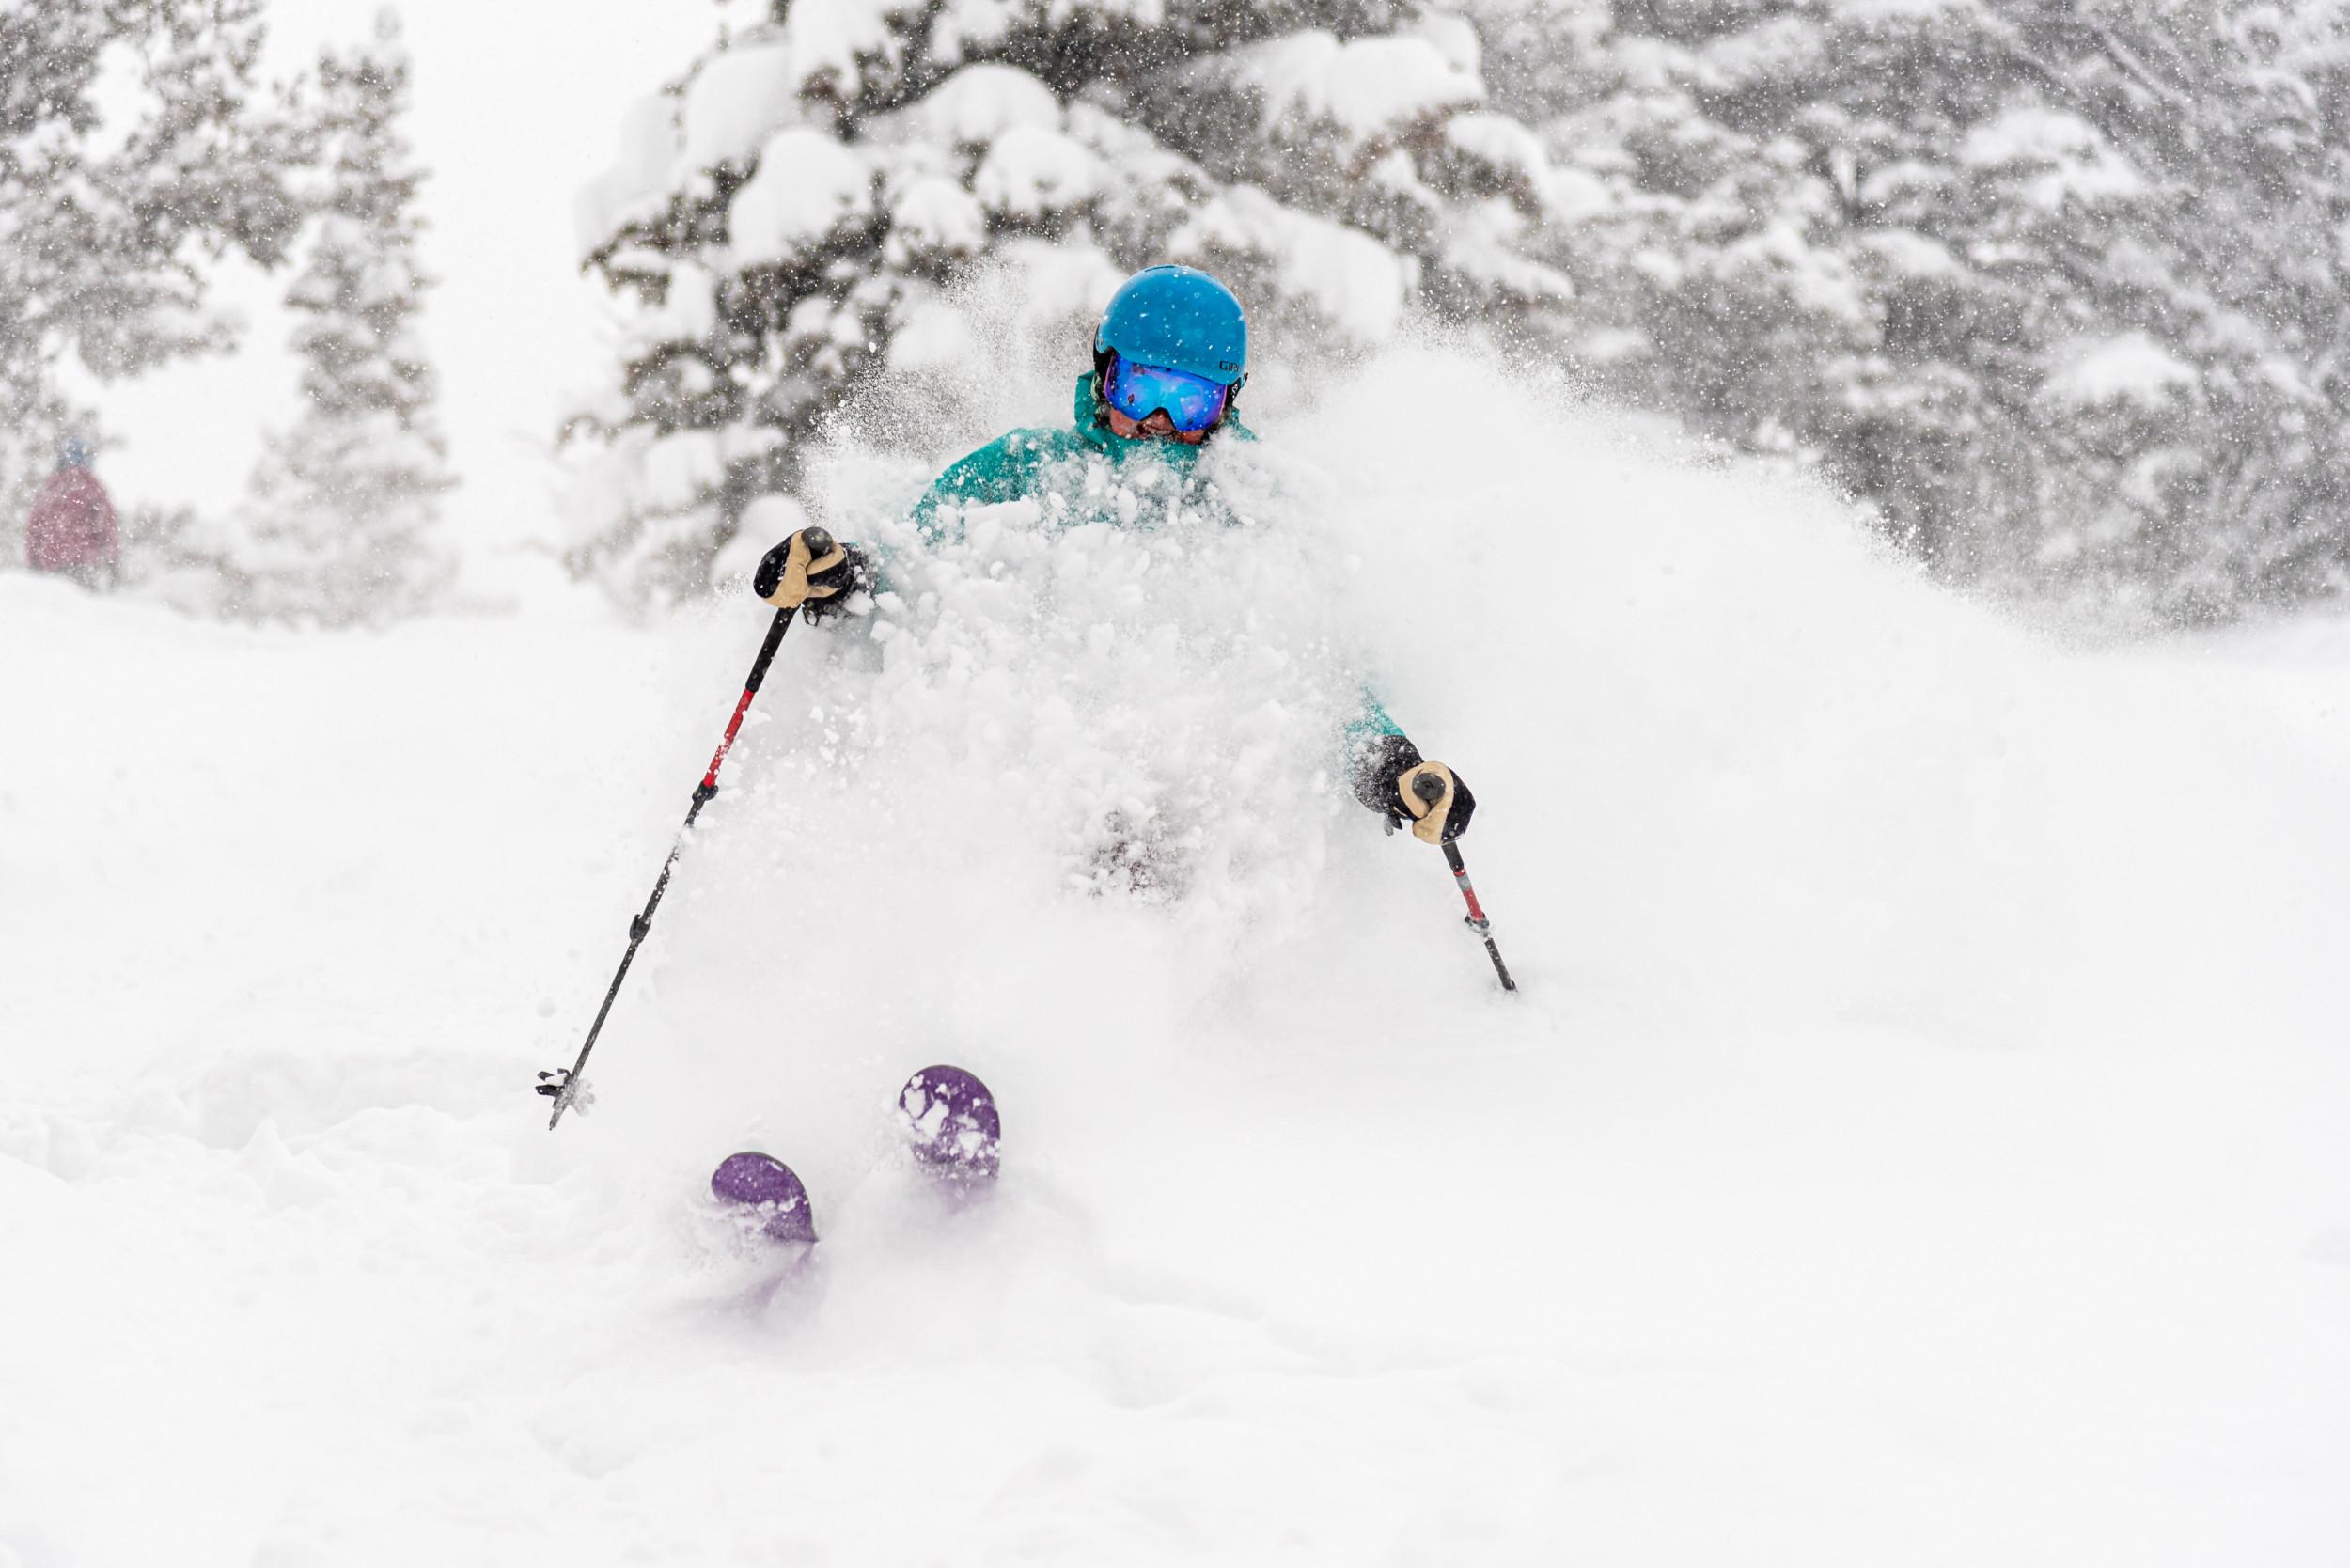 ikon-solitude-mountain powder skiing